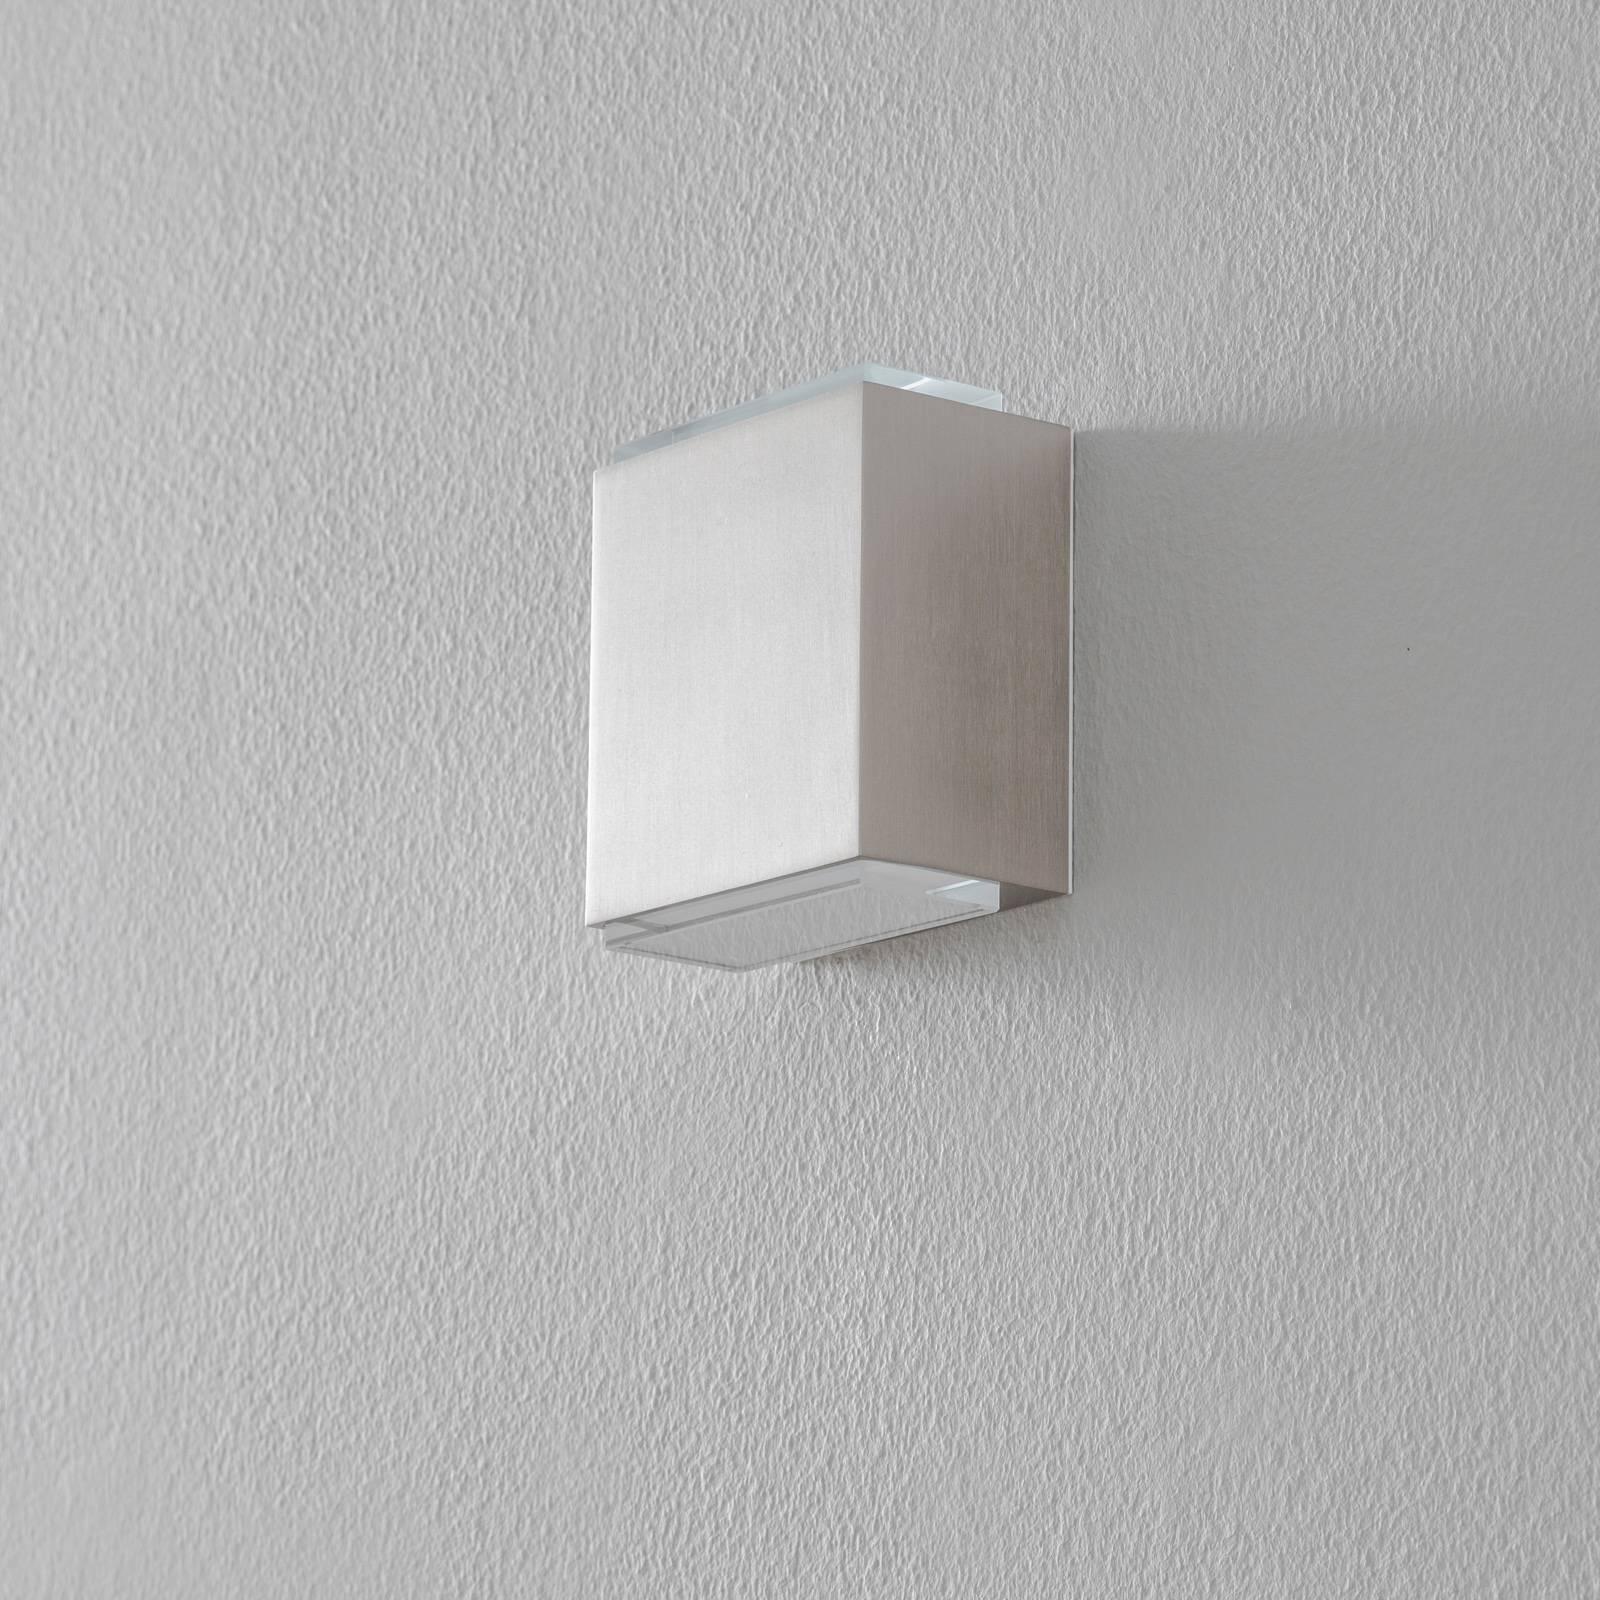 BEGA 23013 LED-seinävalaisin 3000K 9cm 510lm teräs